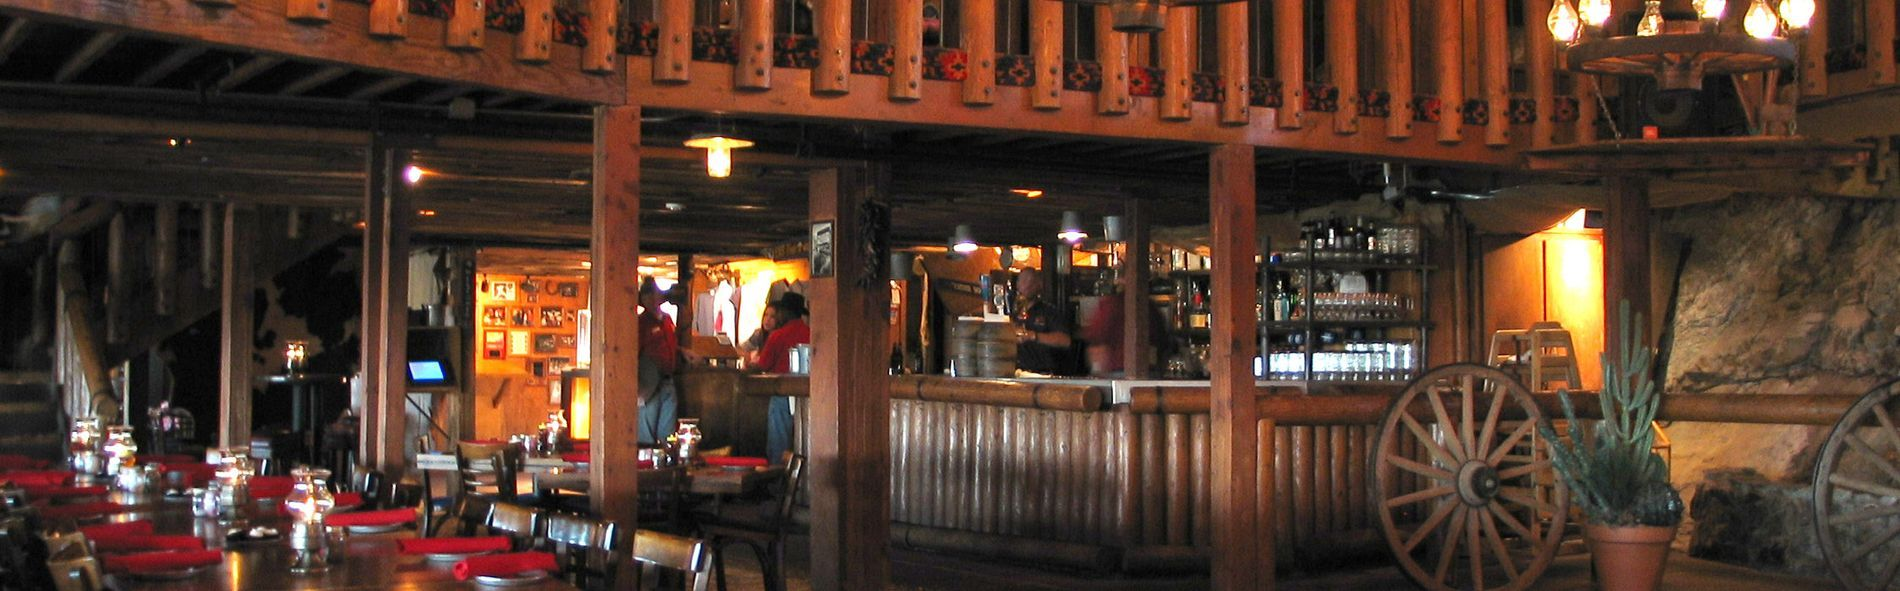 Rustlers Rooste Steakhouse Arizona Grand Resort Amp Spa